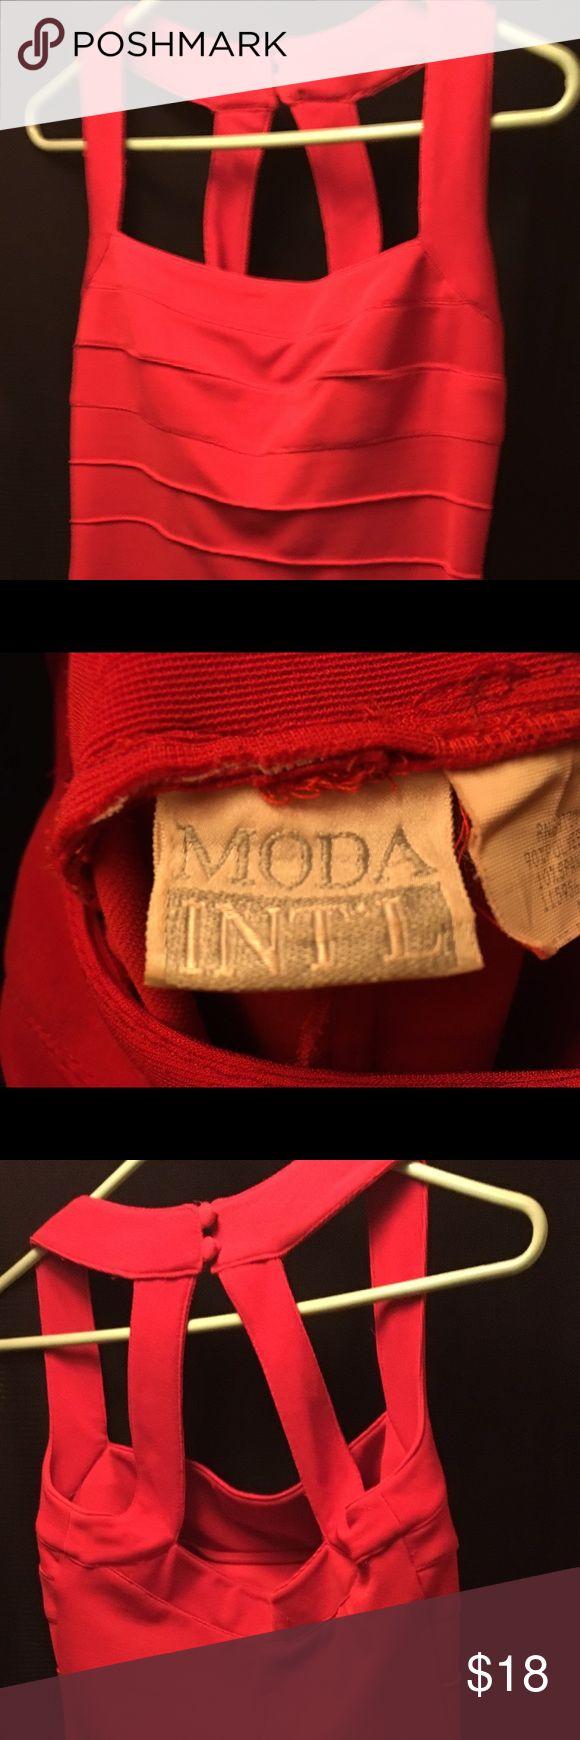 Womens dress Moda International Moda International brand, new. Moda International Dresses